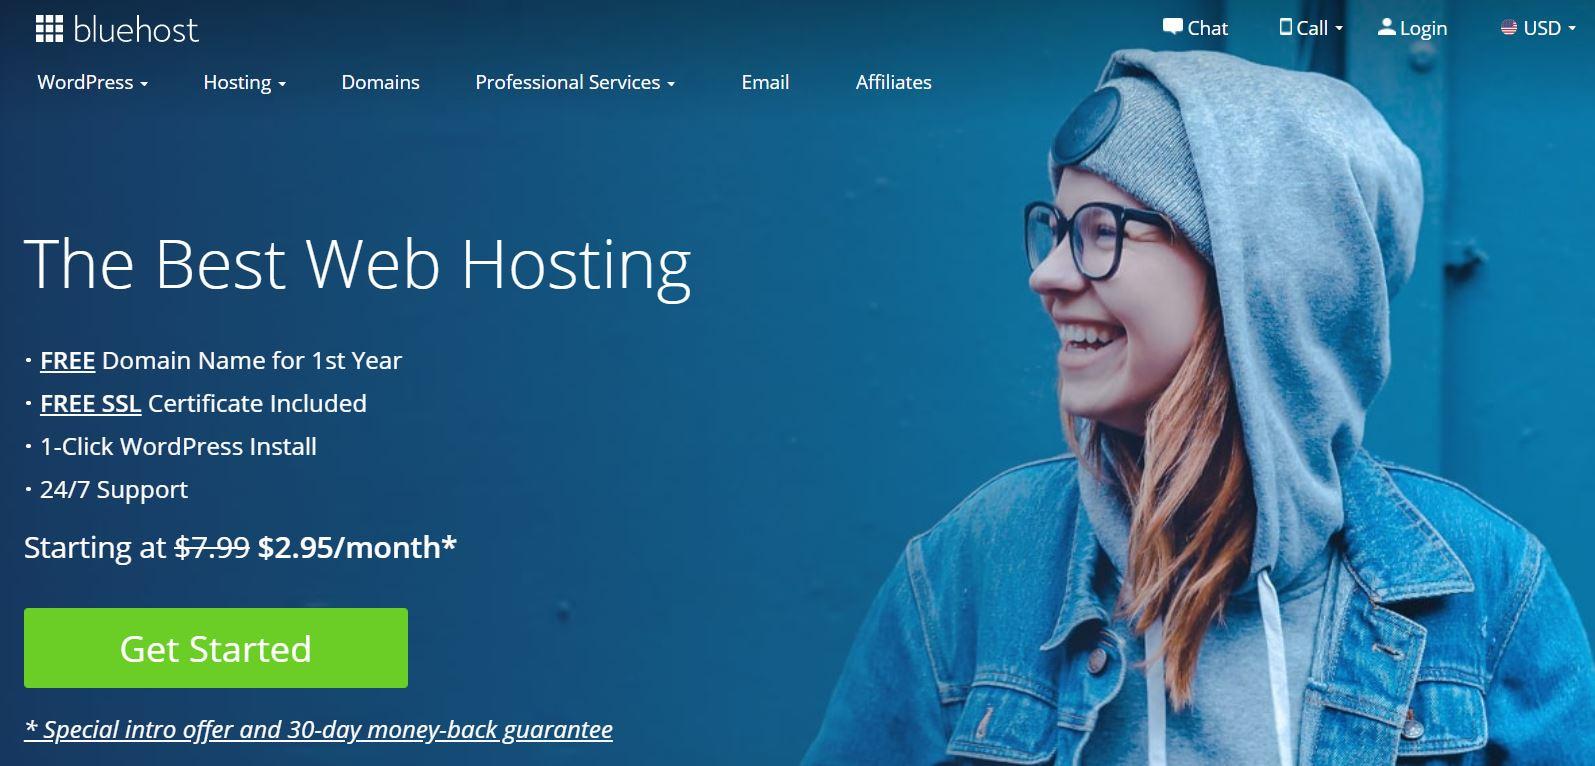 GoDaddy最受欢迎的替代产品之一是Bluehost。